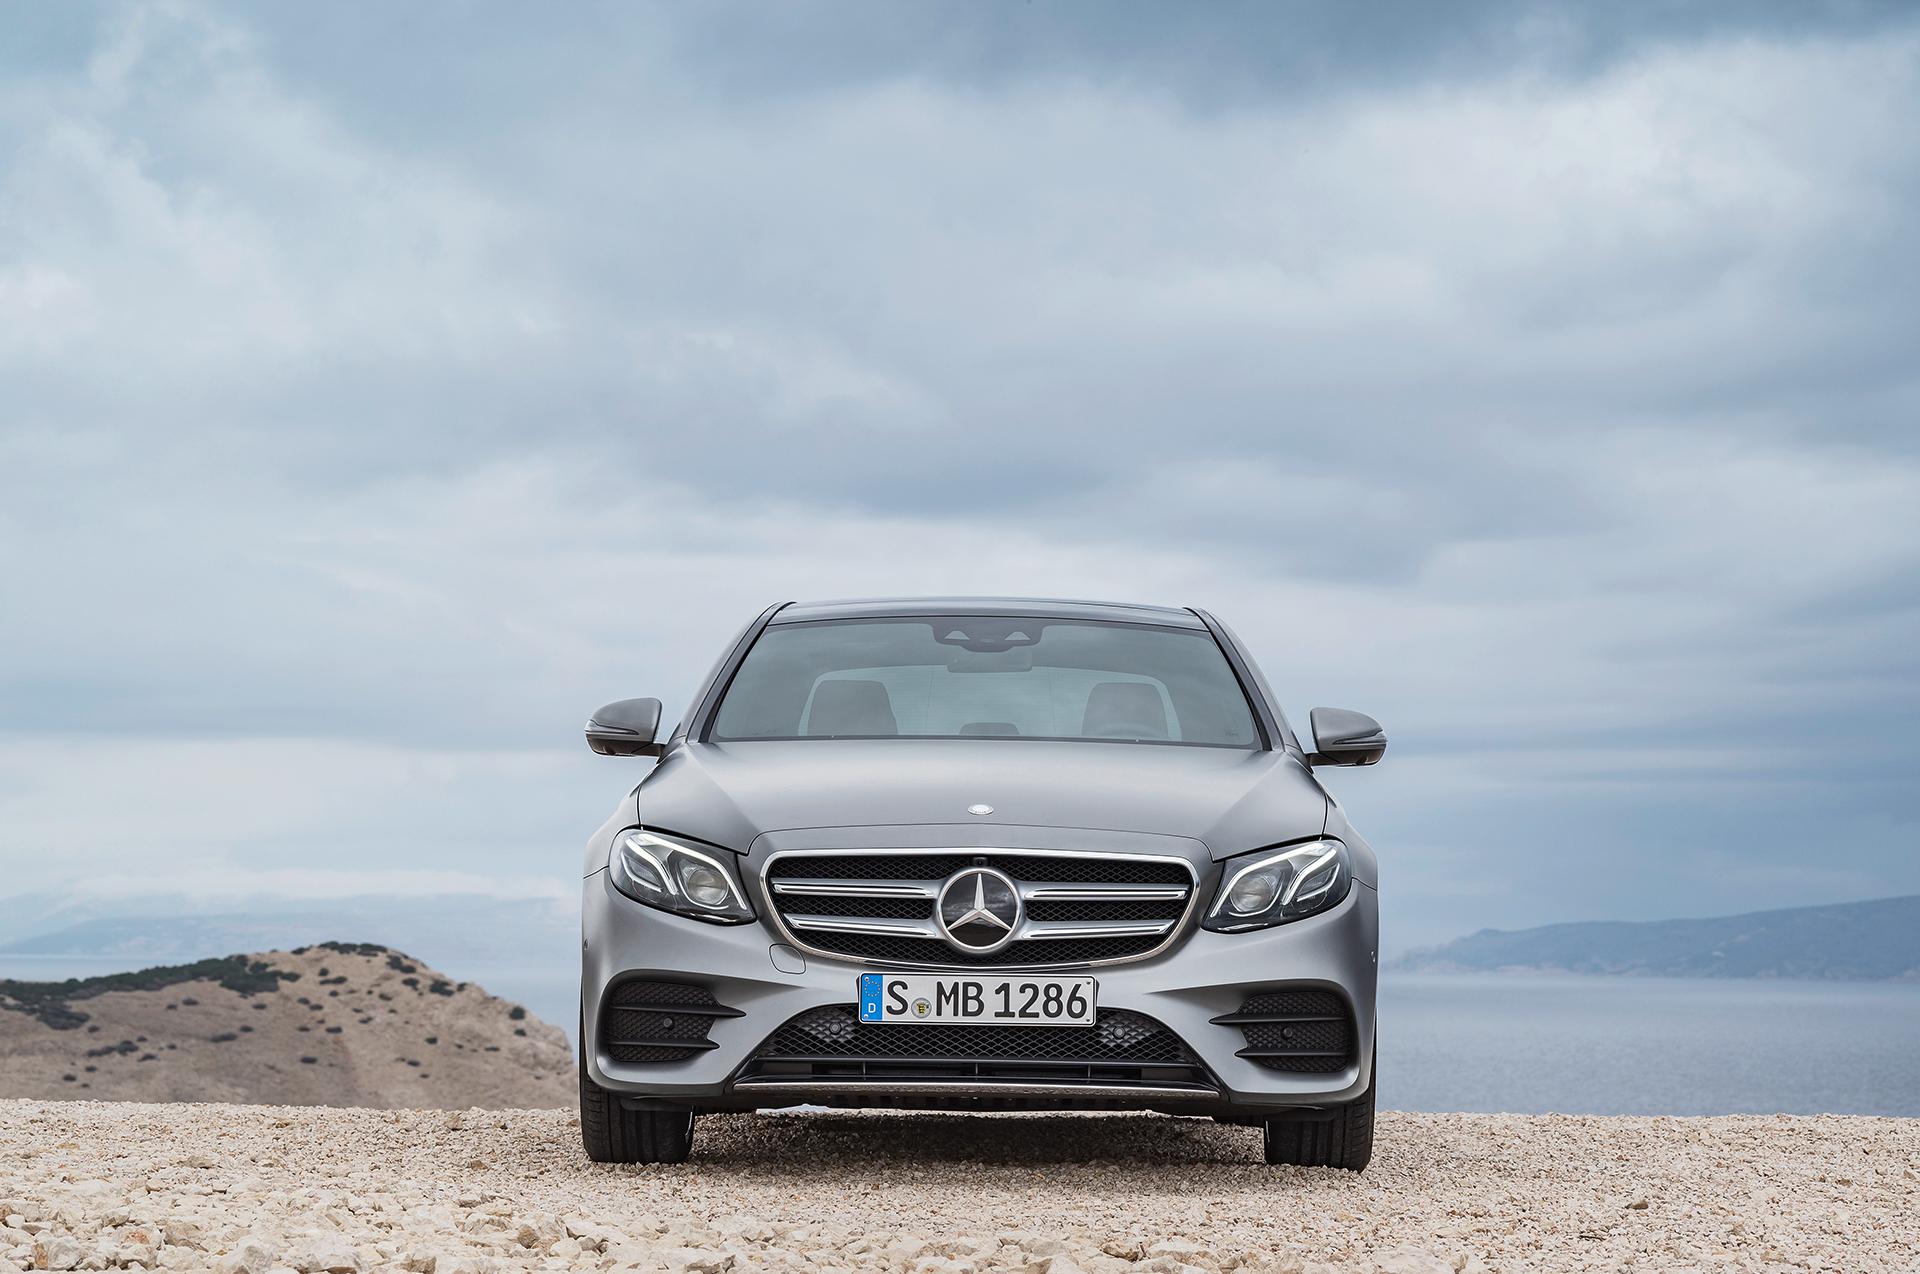 Mercedes-Benz E Class - 2016 - E400 - front / avant